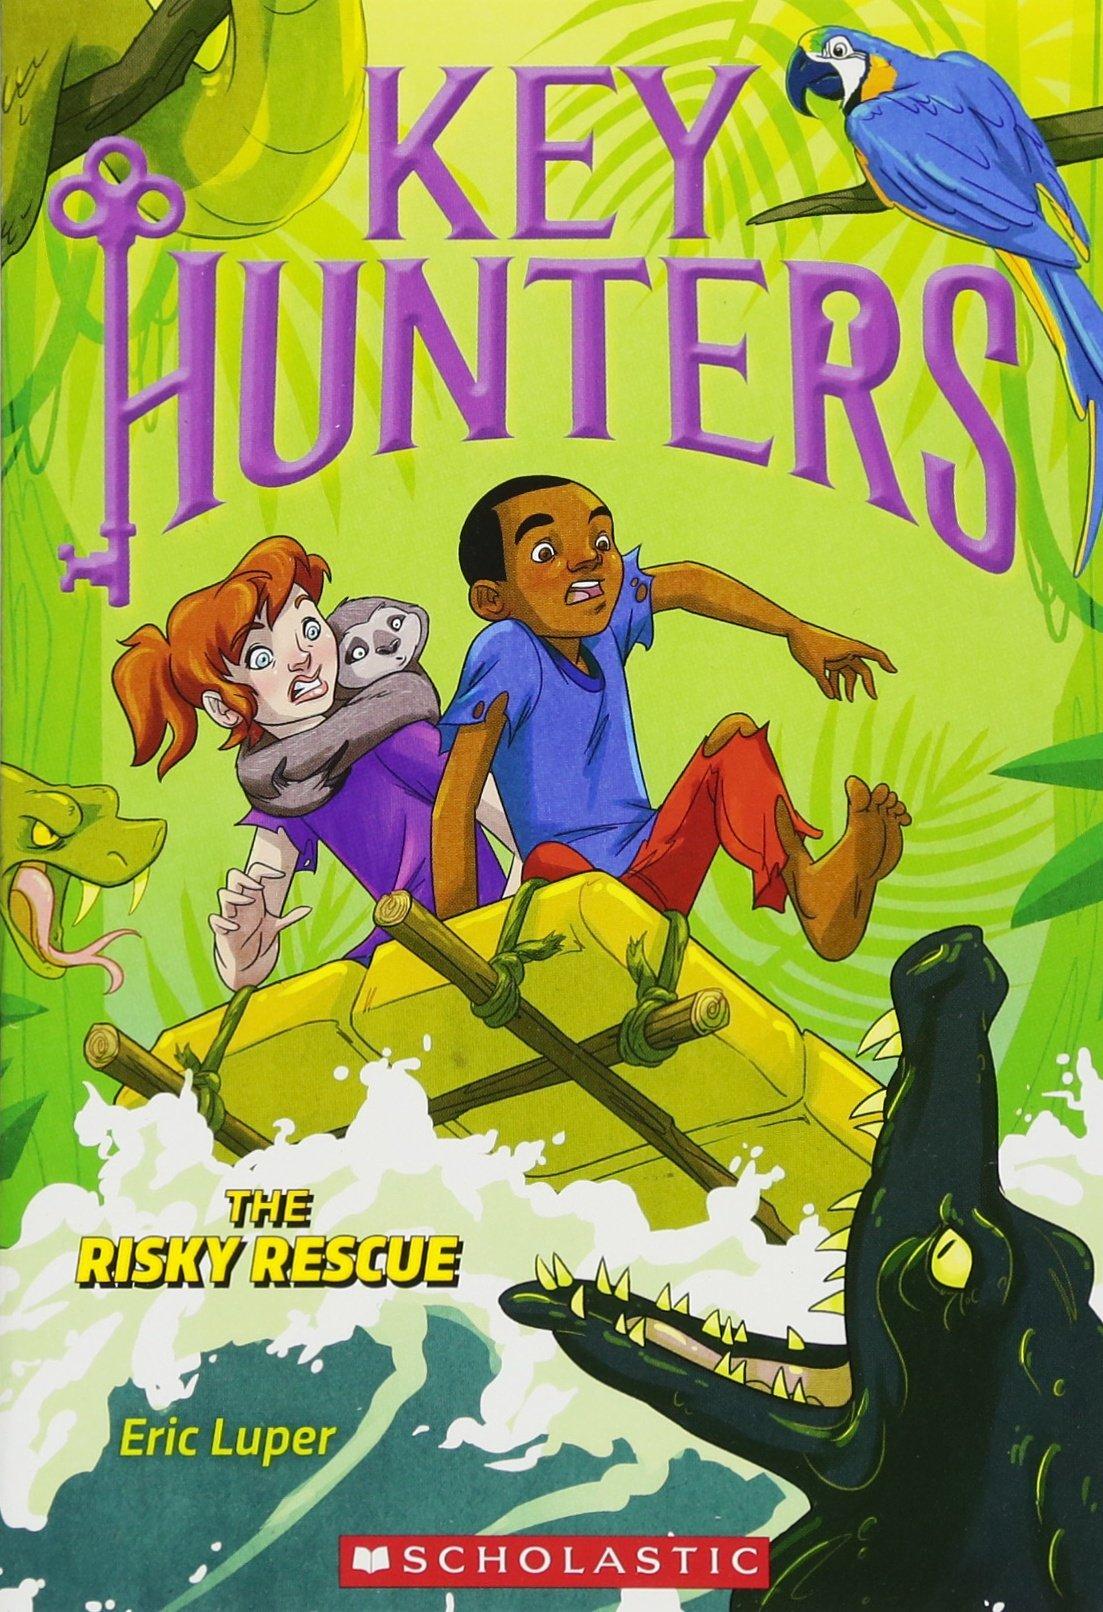 The Risky Rescue (Key Hunters #6)